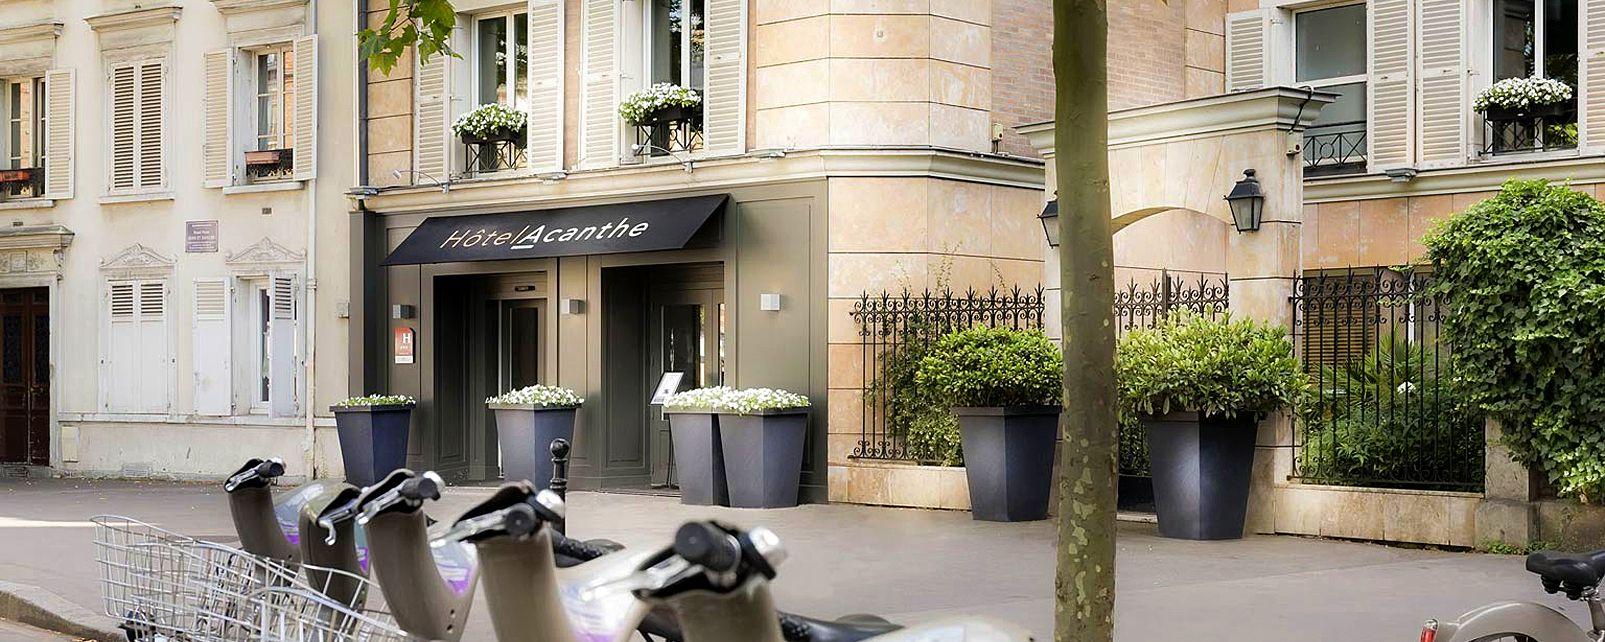 Hôtel Quality Hotel Acanthe - Boulogne Billancourt